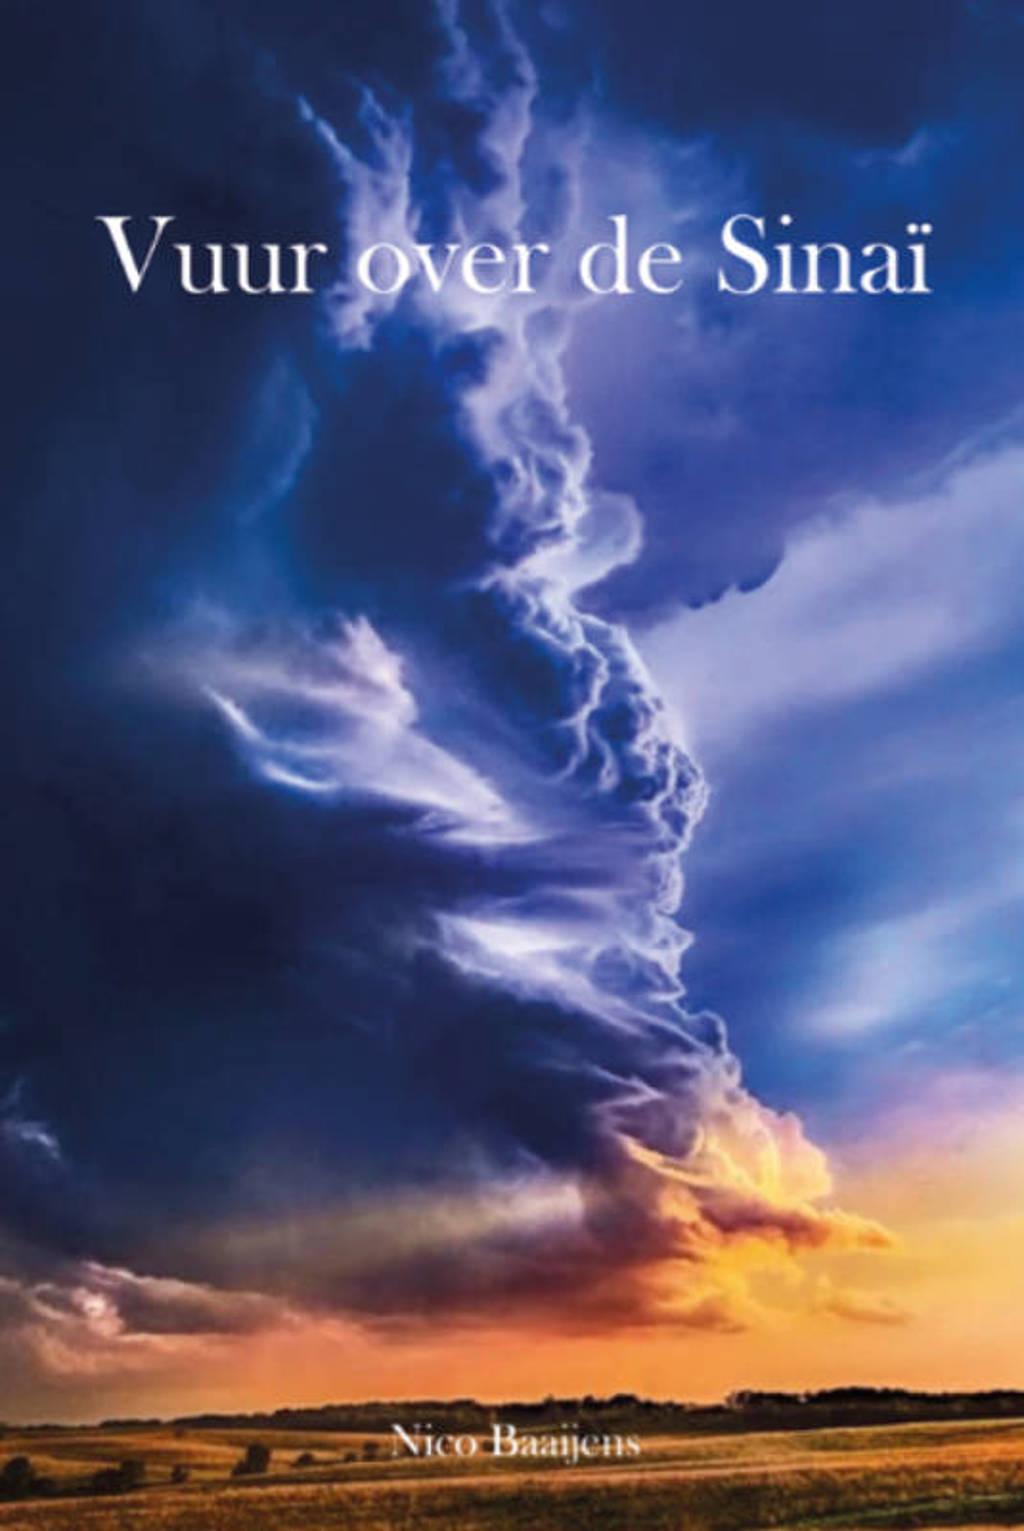 Vuur over de Sinaï - Nico Baaijens